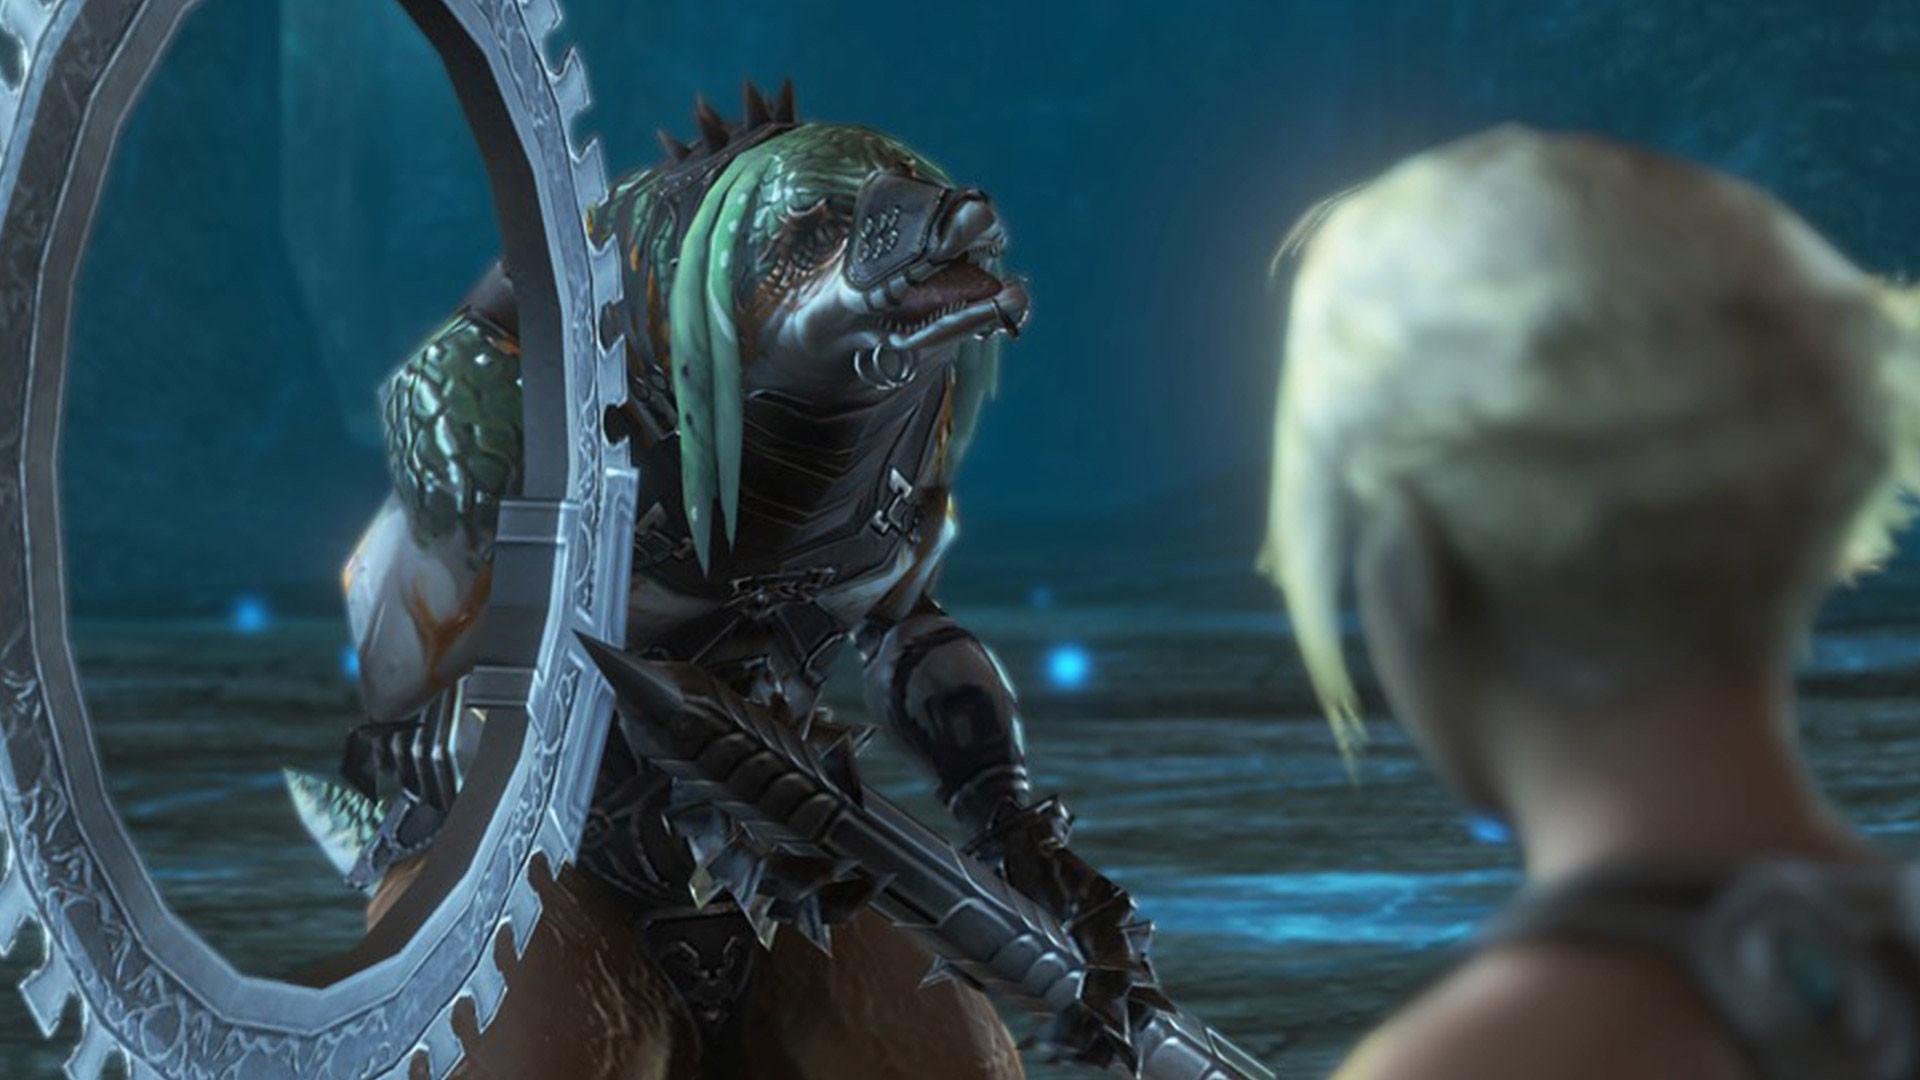 Final Fantasy XII The Zodiac Age 4K Wallpaper …